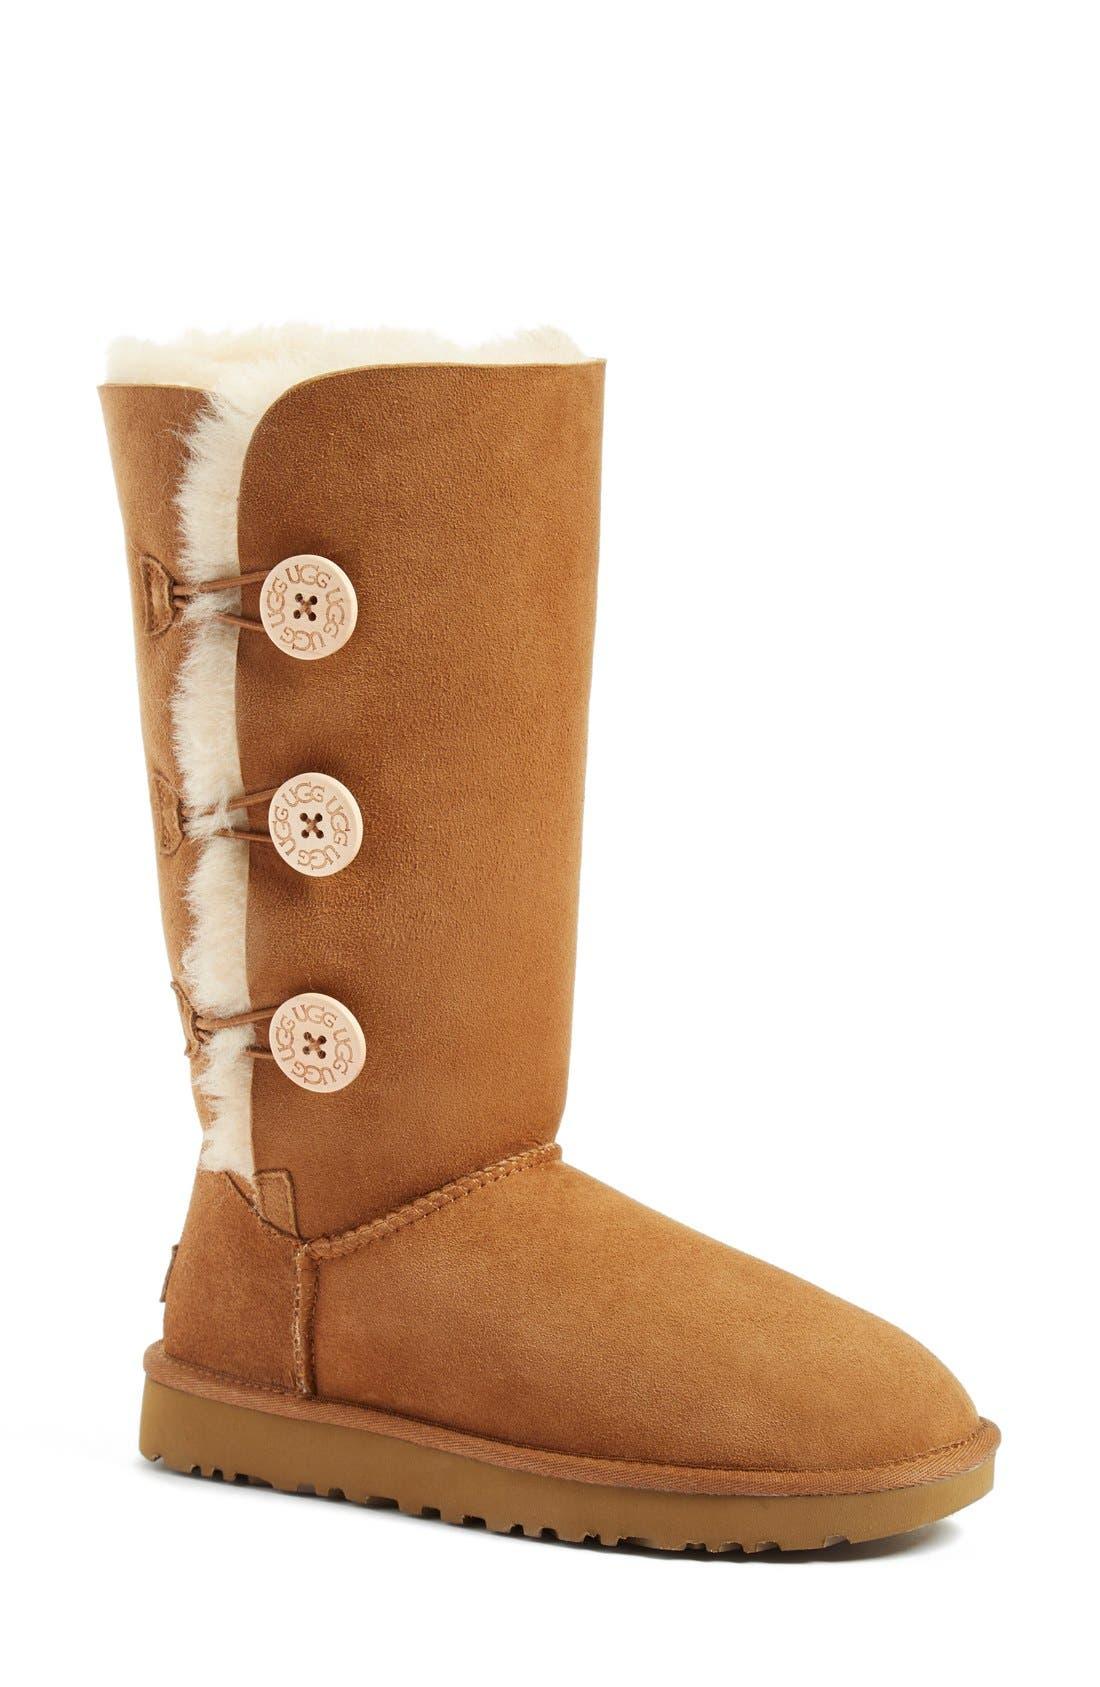 Main Image - UGG® 'Bailey Button Triplet II' Boot (Women)